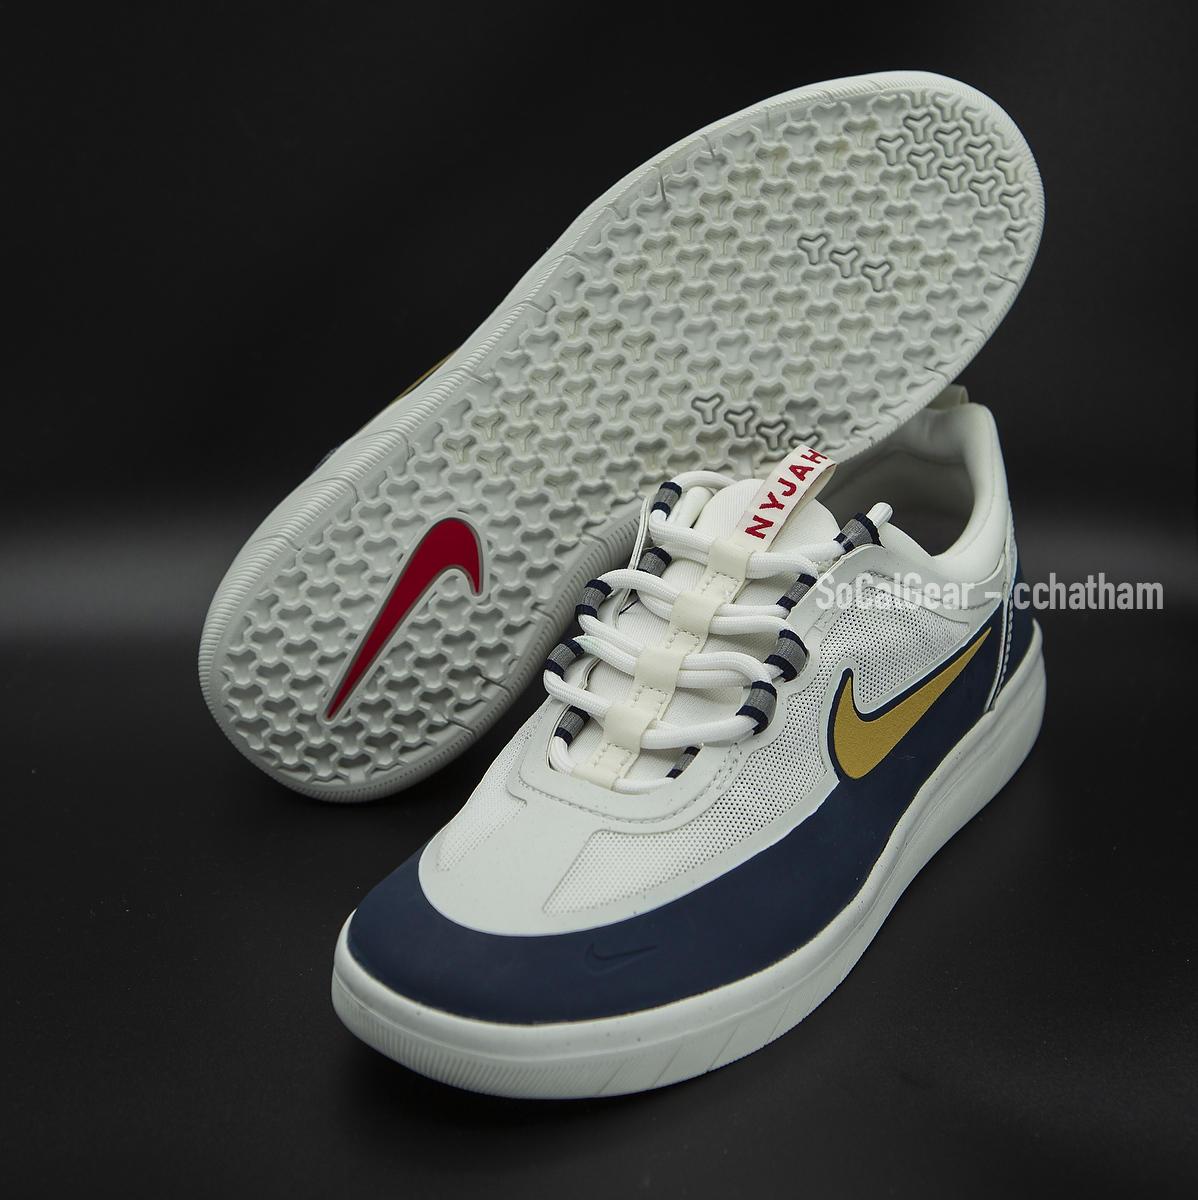 Nike SB Nyjah Free 2.0 Spiridon Olympic Skateboard Shoes Men's ...